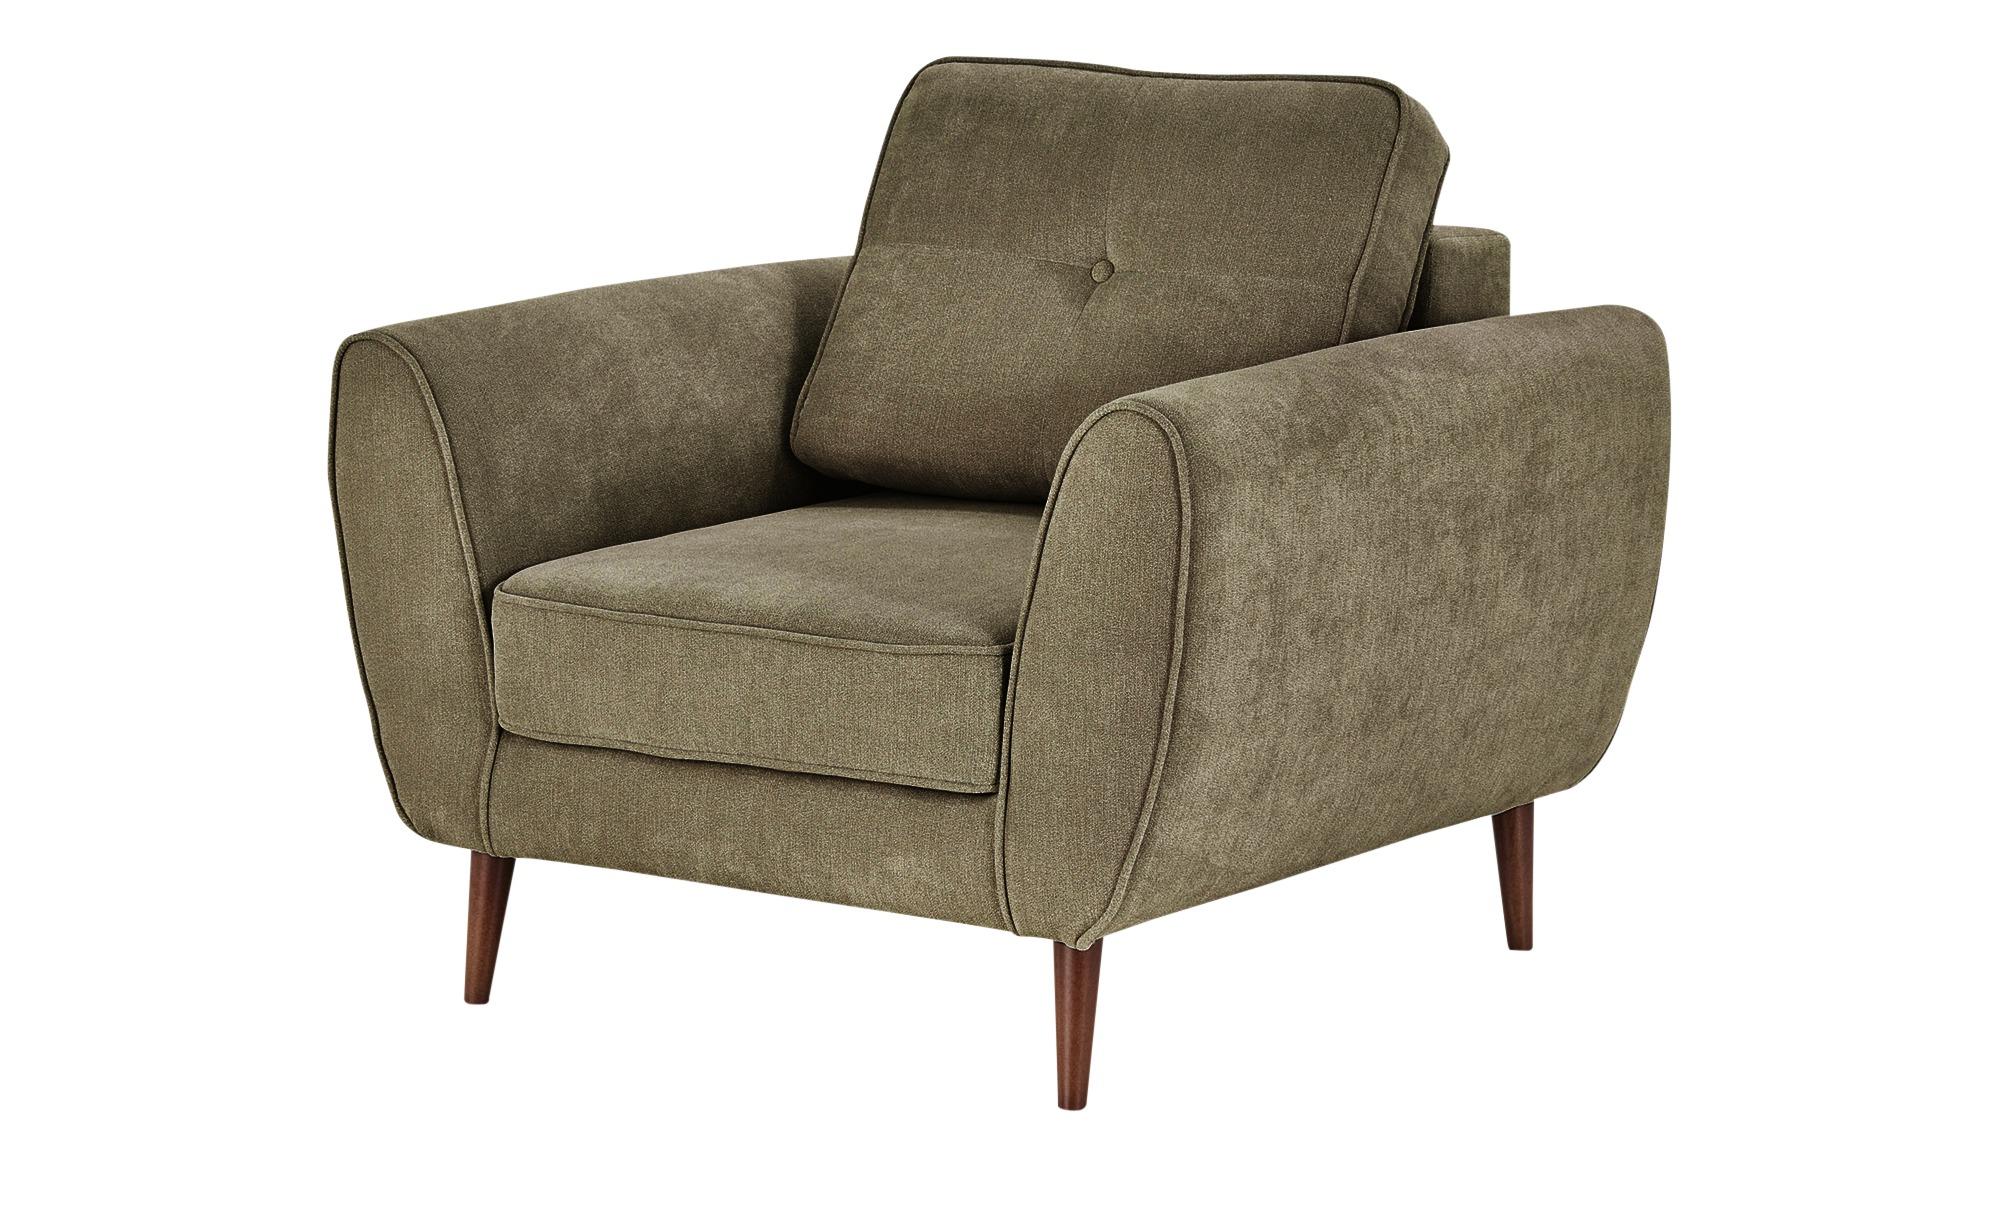 switch Sessel  Candy ¦ braun ¦ Maße (cm): B: 102 H: 85 T: 94 Polstermöbel > Sessel > Polstersessel - Höffner